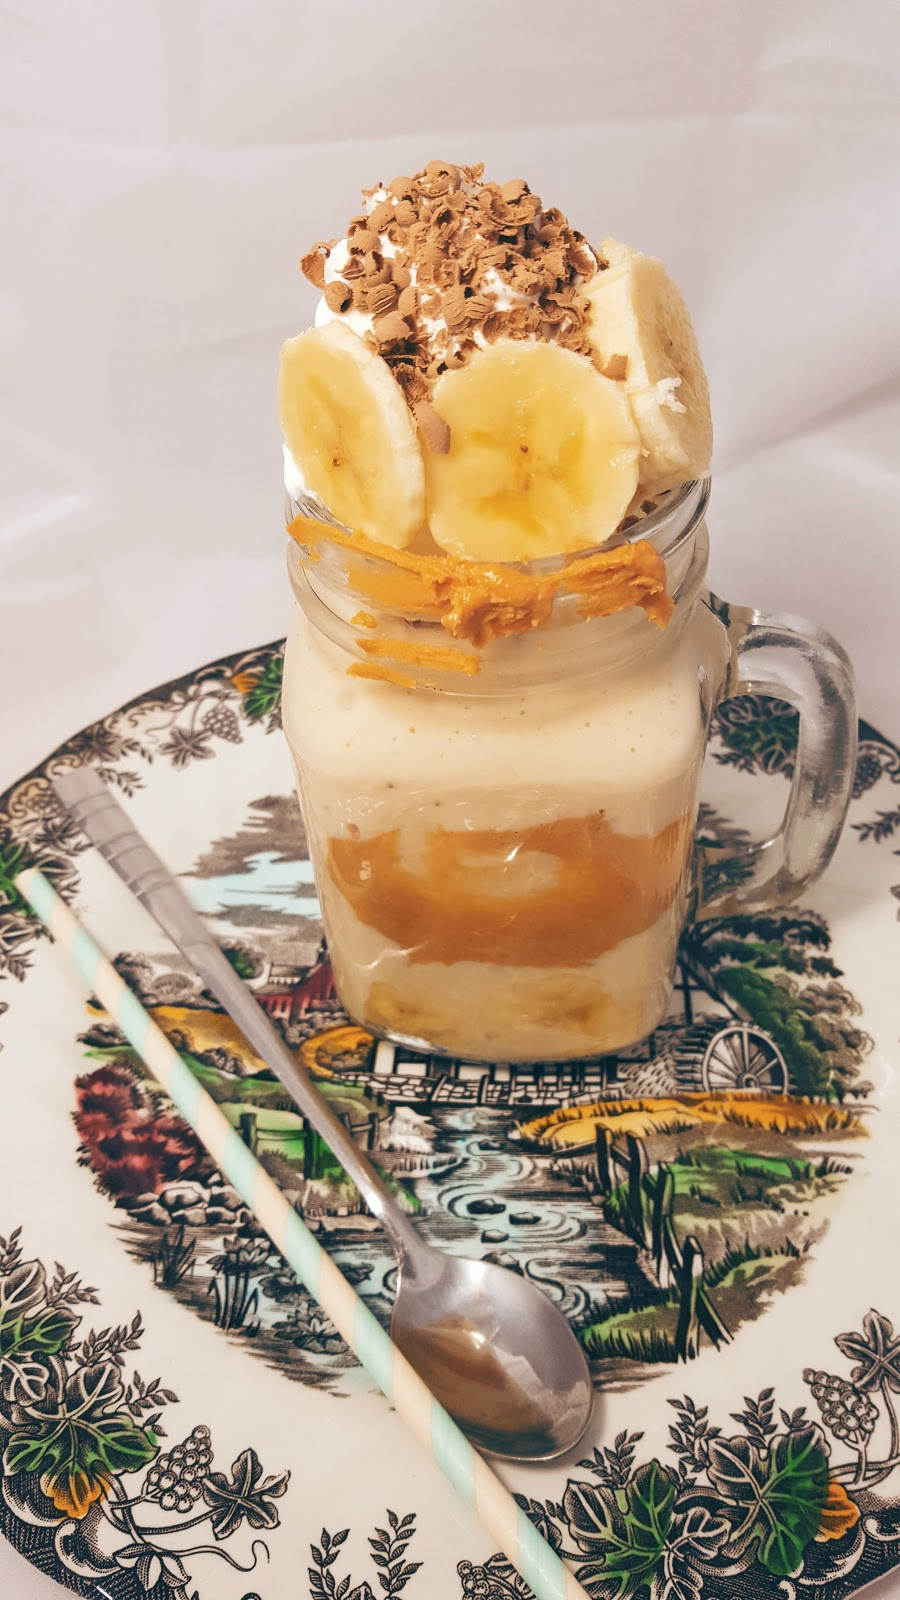 Healthier Banana And Peanut Butter Freak Shake